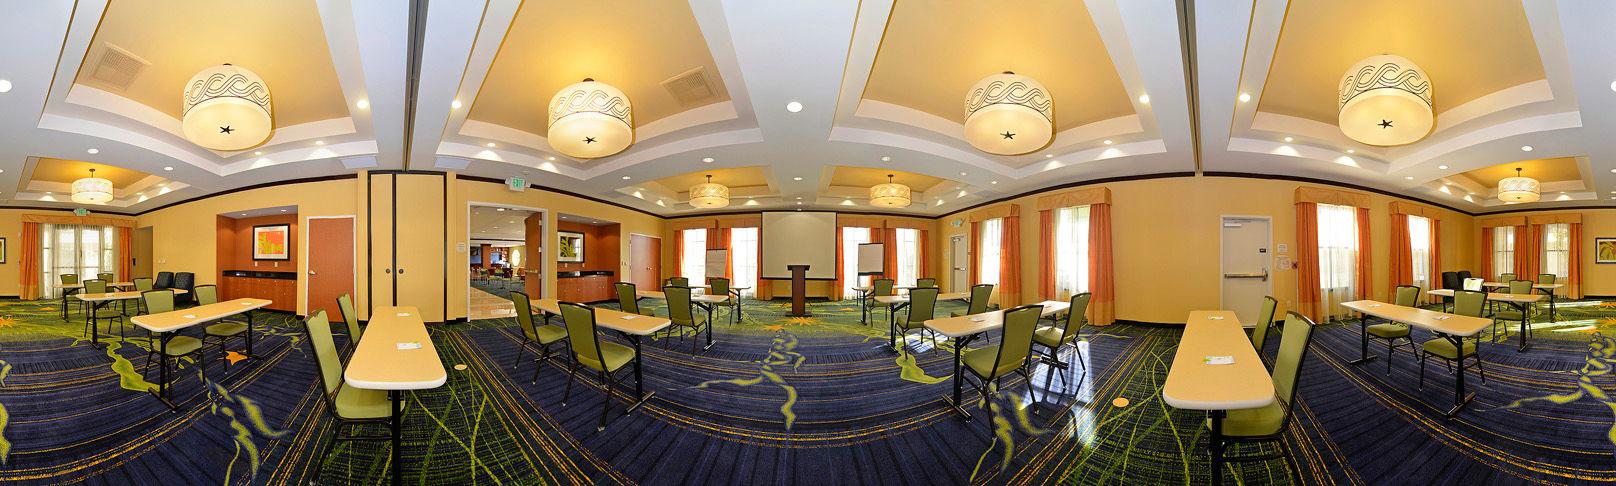 Fairfield Inn & Suites by Marriott Santa Cruz - Capitola image 14